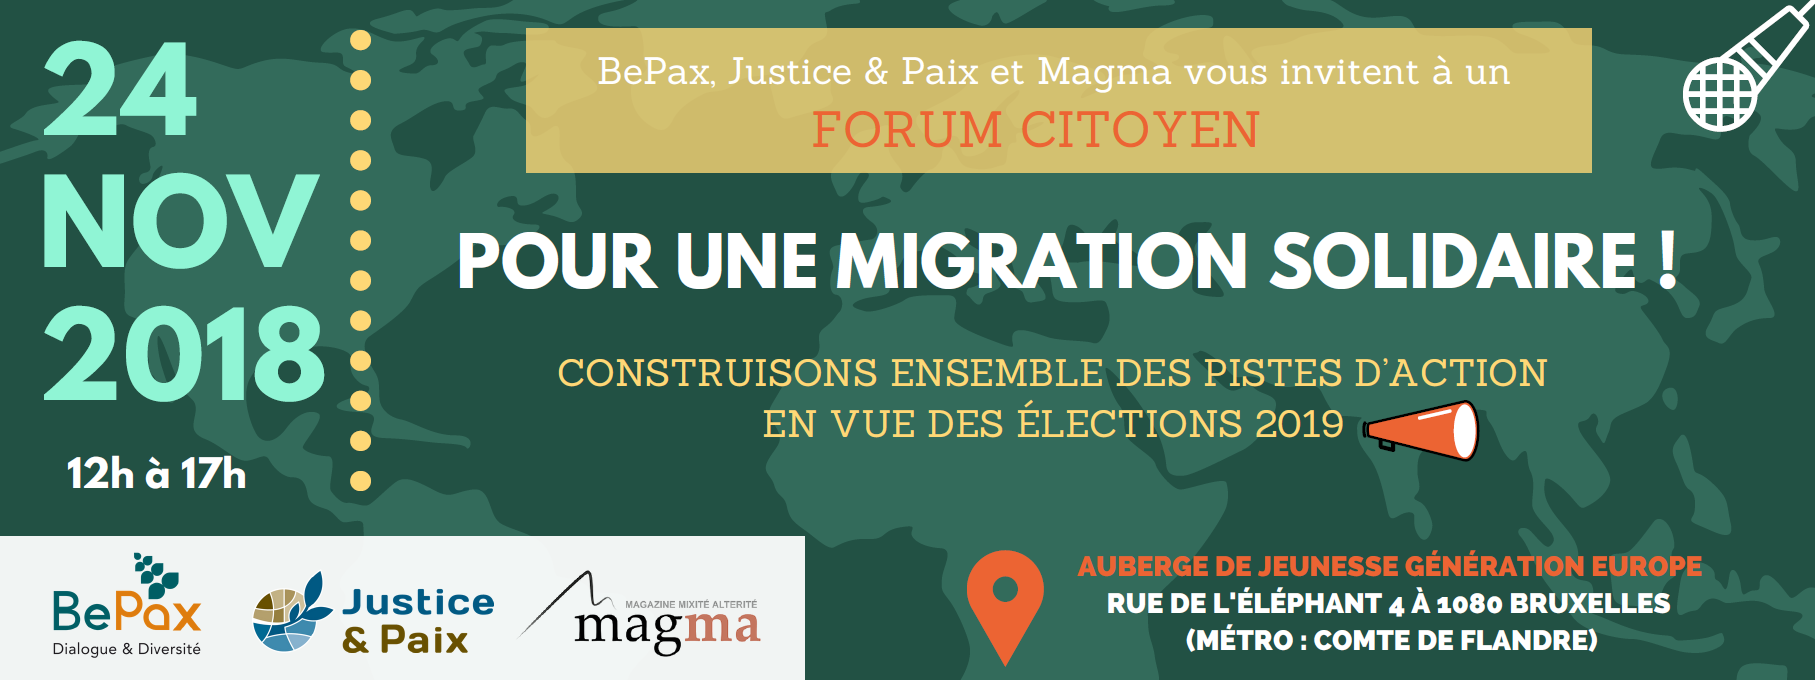 invitation-forum-recto.png